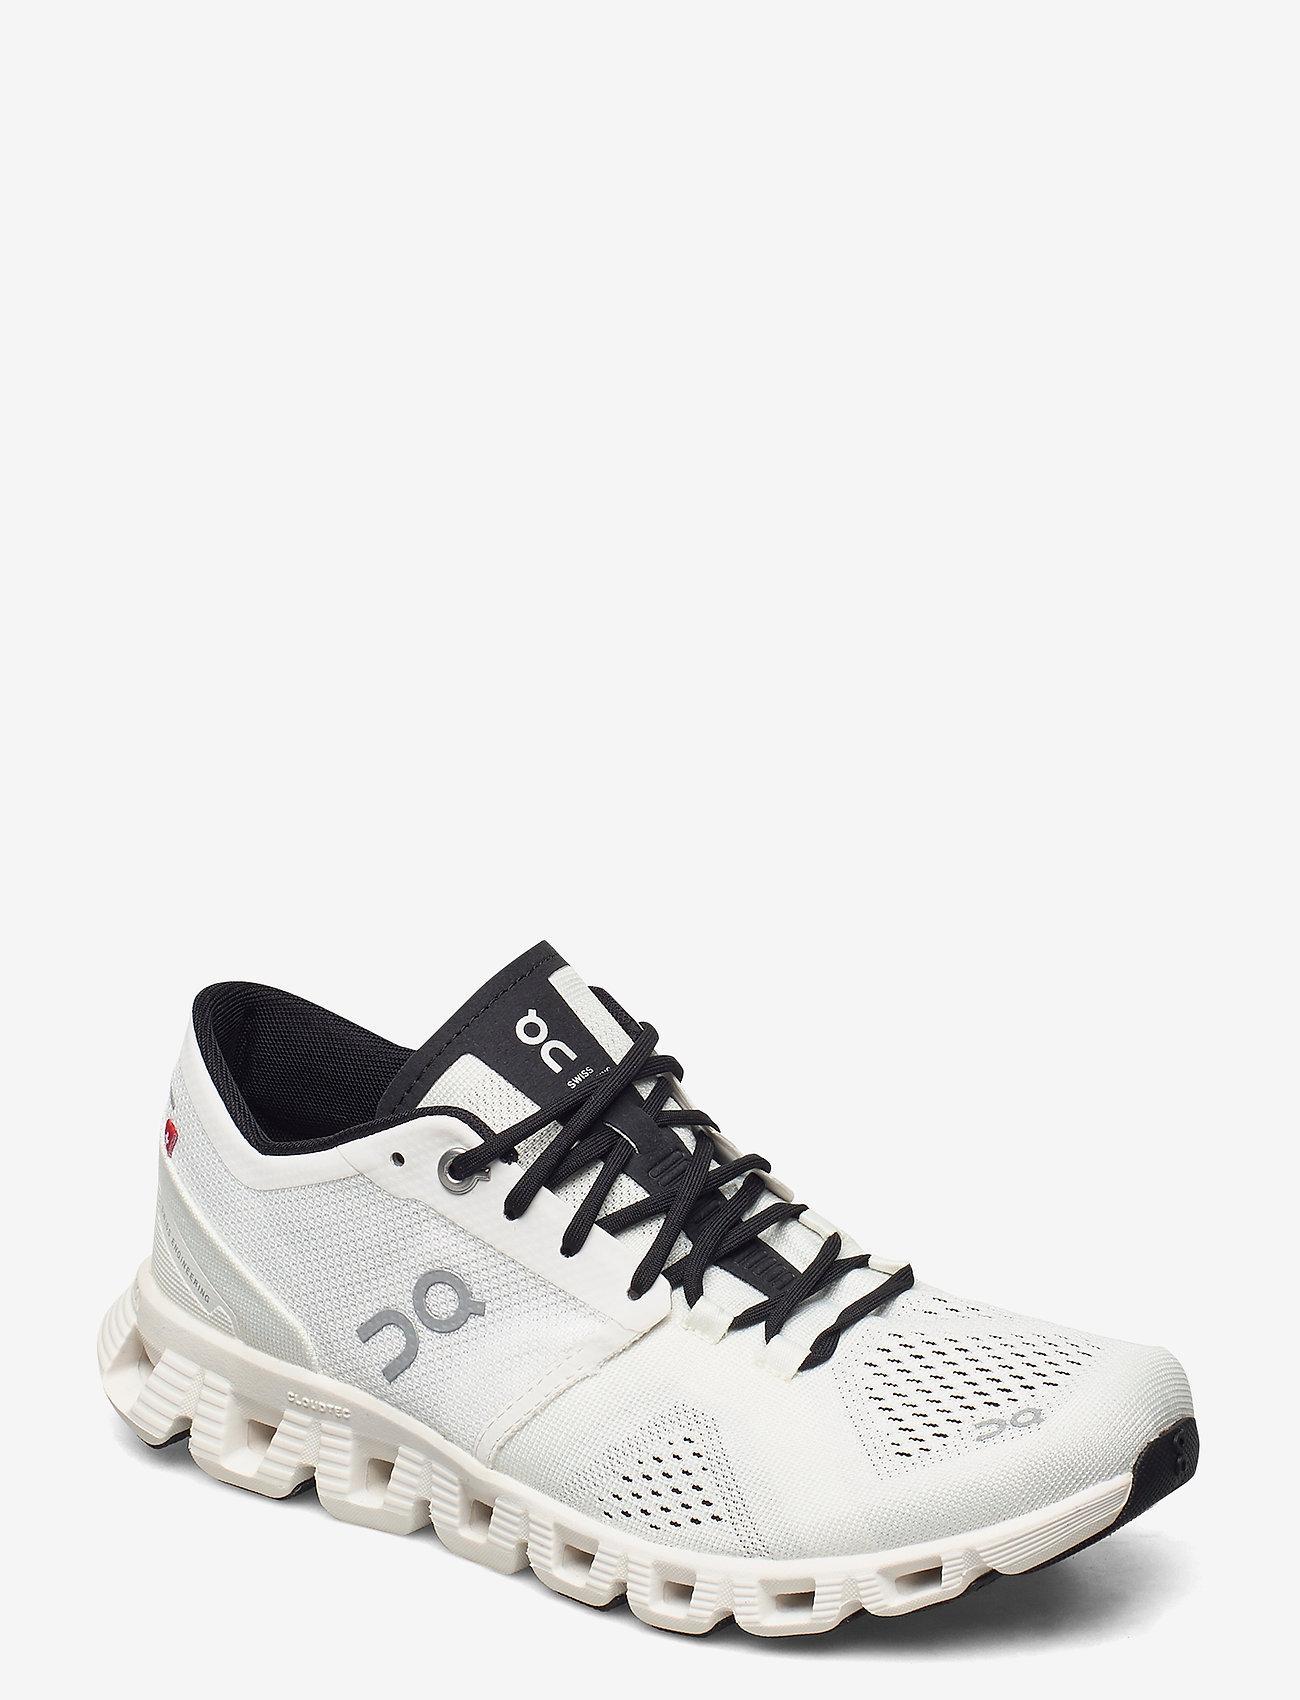 On - CloudX - running shoes - white/black - 1